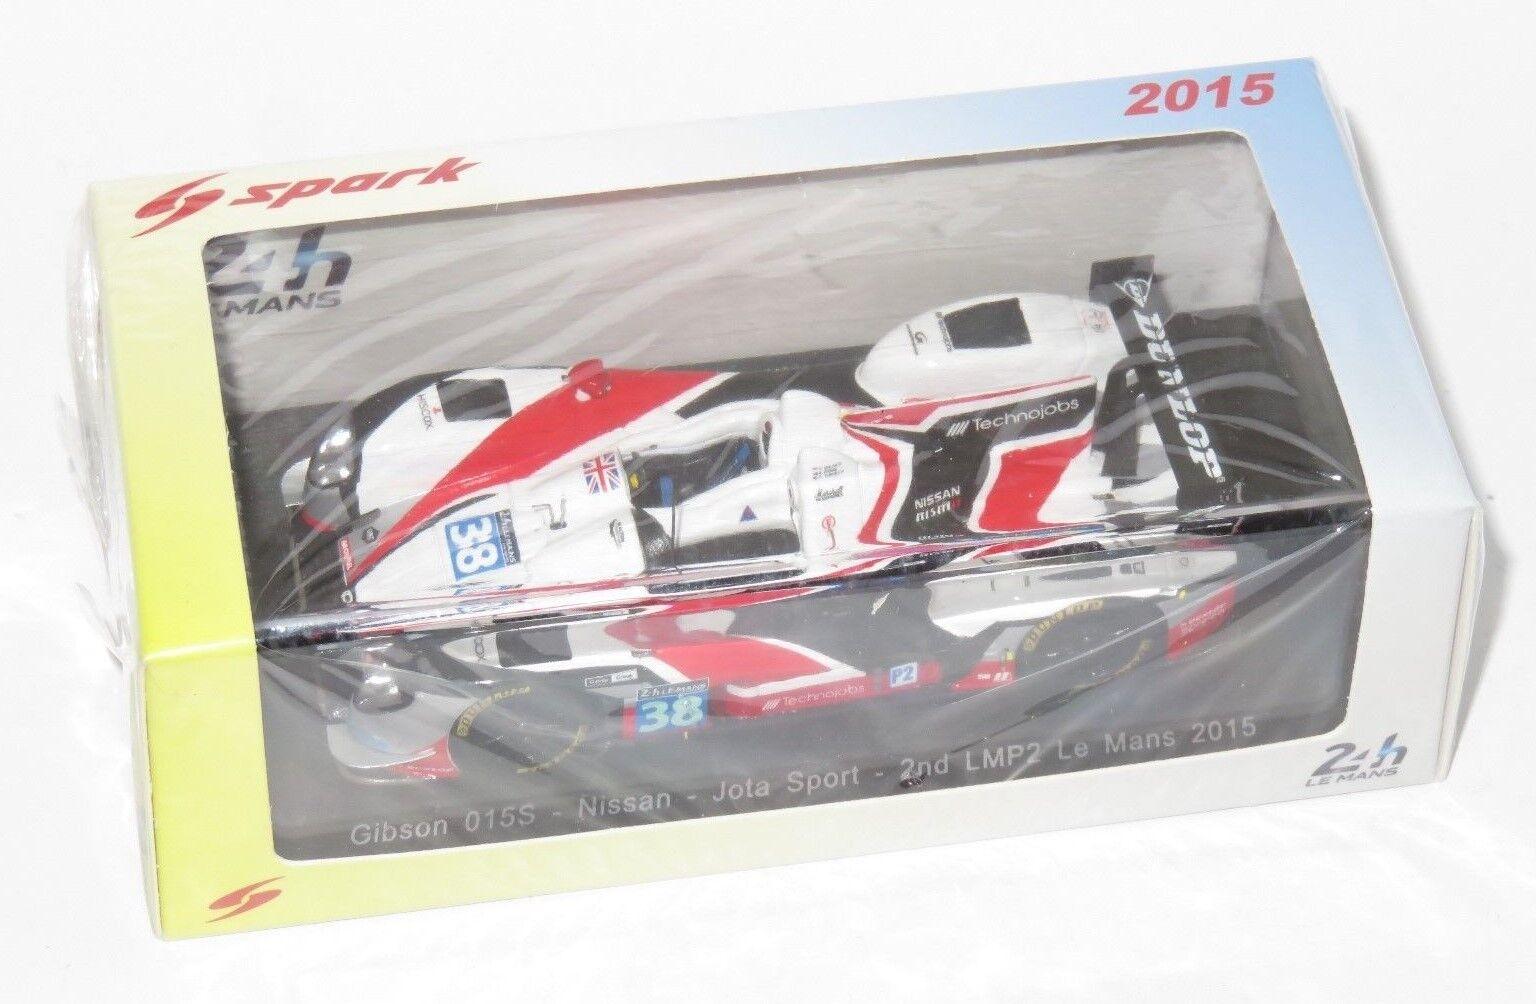 1/43 Gibson 015S Zytek Nissan Jota Sport Le Mans 24 HRS 2018 38 2nd LMP2